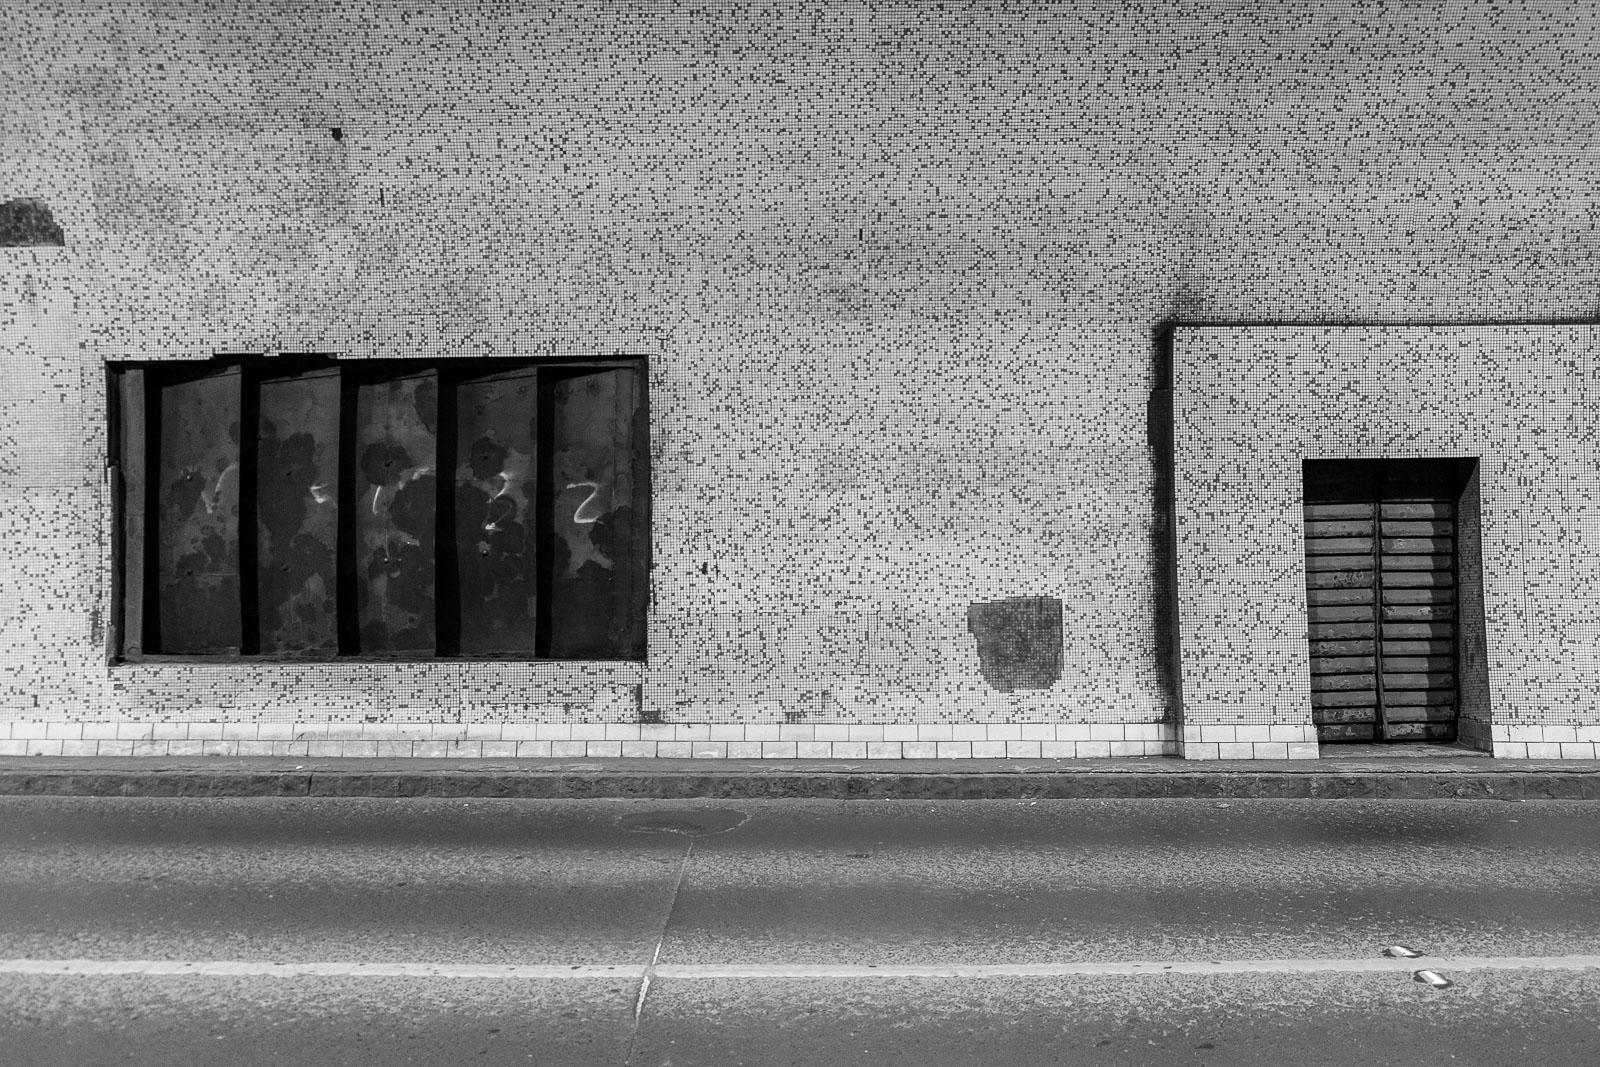 budapest-32.jpg